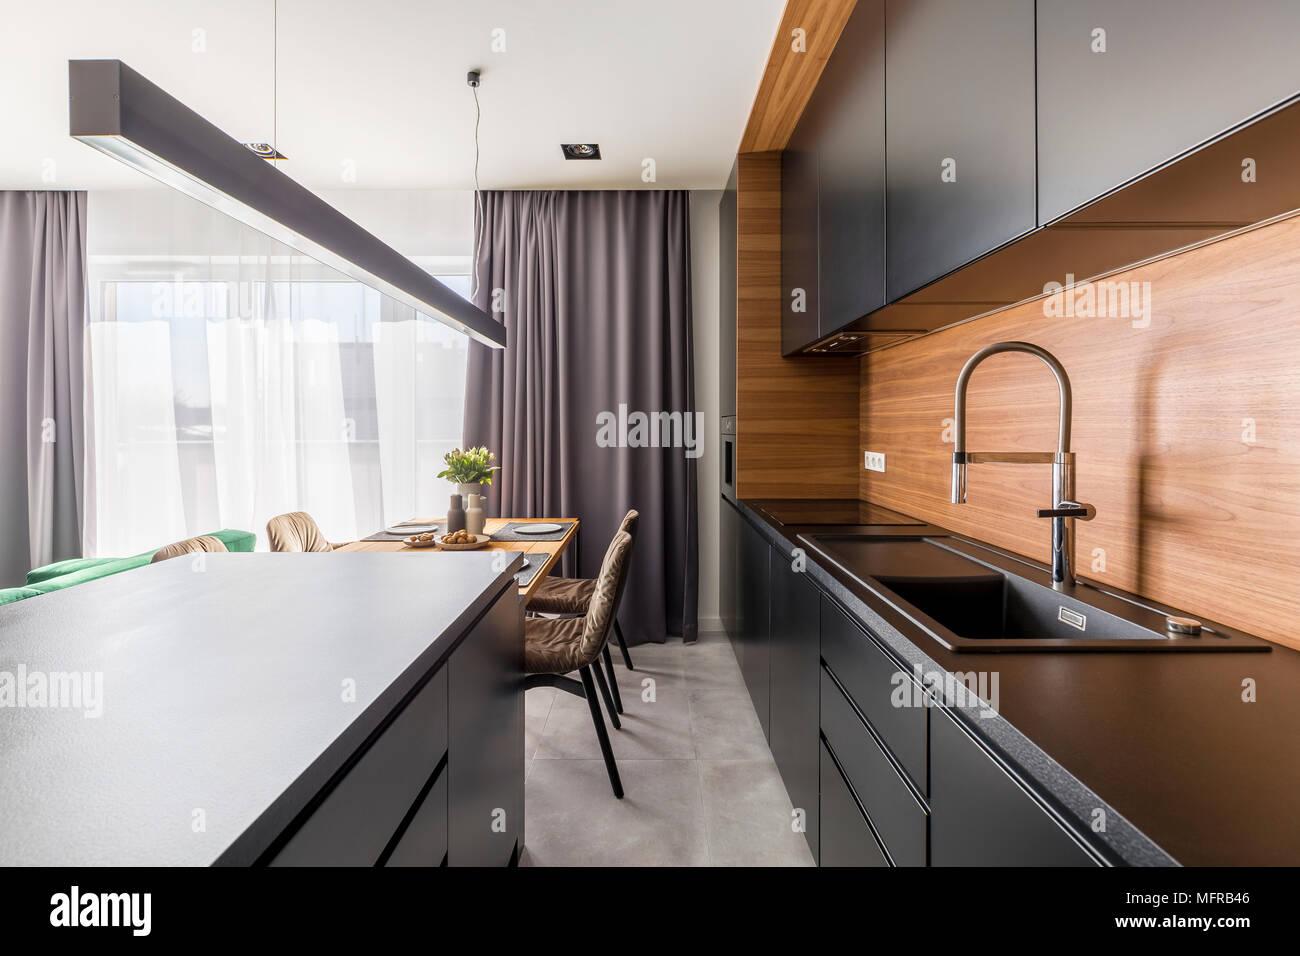 Atemberaubend Küche Unter Beleuchtung Lowes Schrank Ideen - Ideen ...